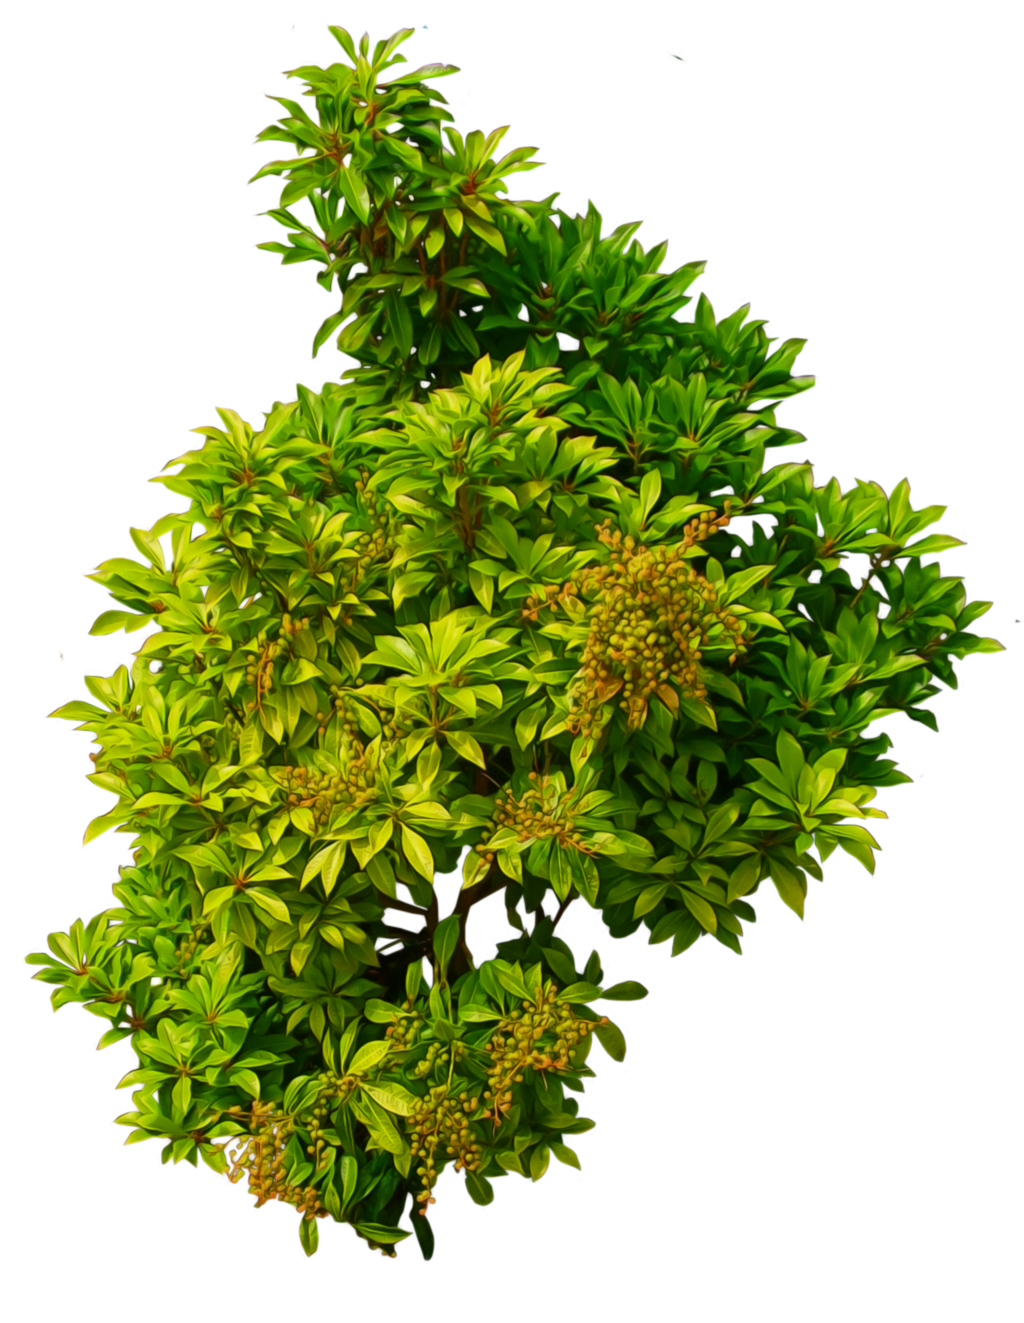 Bush PNG image - Plant PNG HD